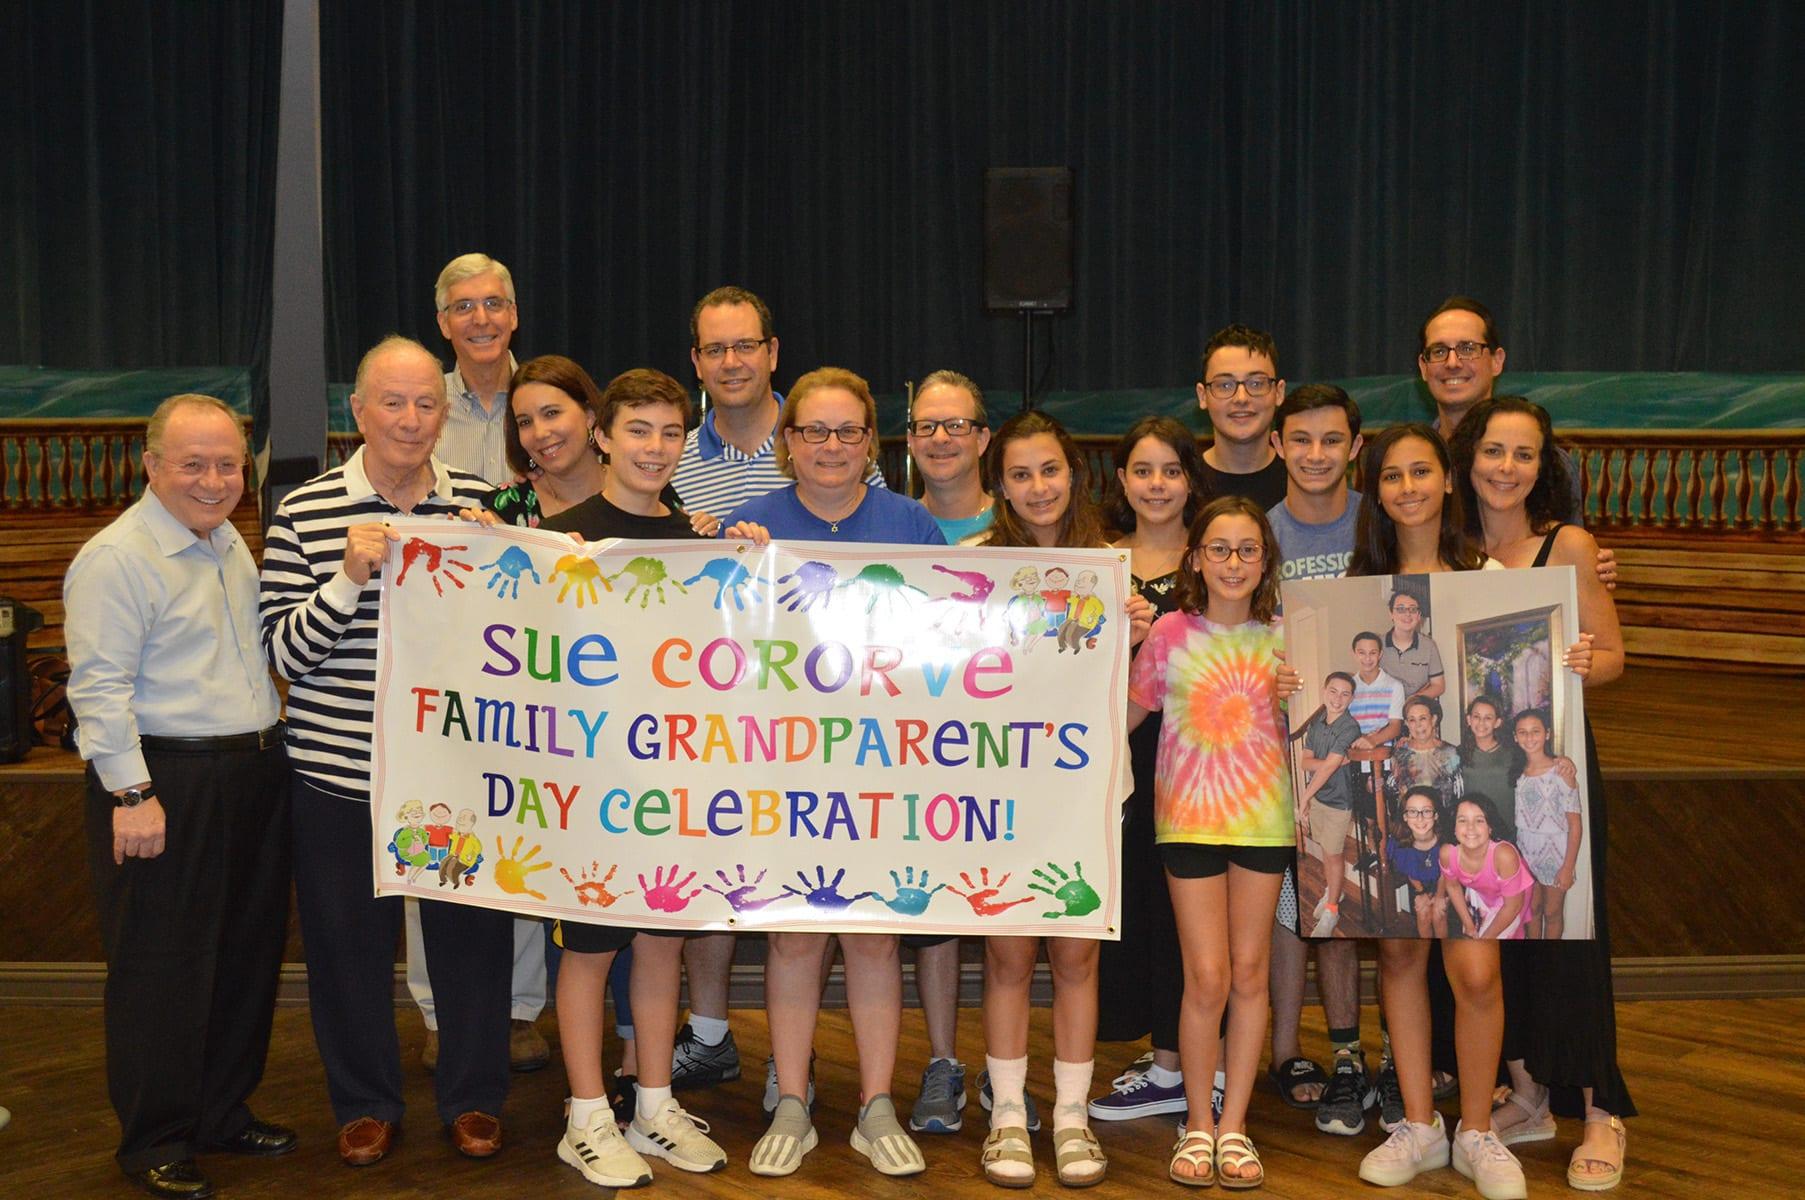 family sponsored grandparents day celebration